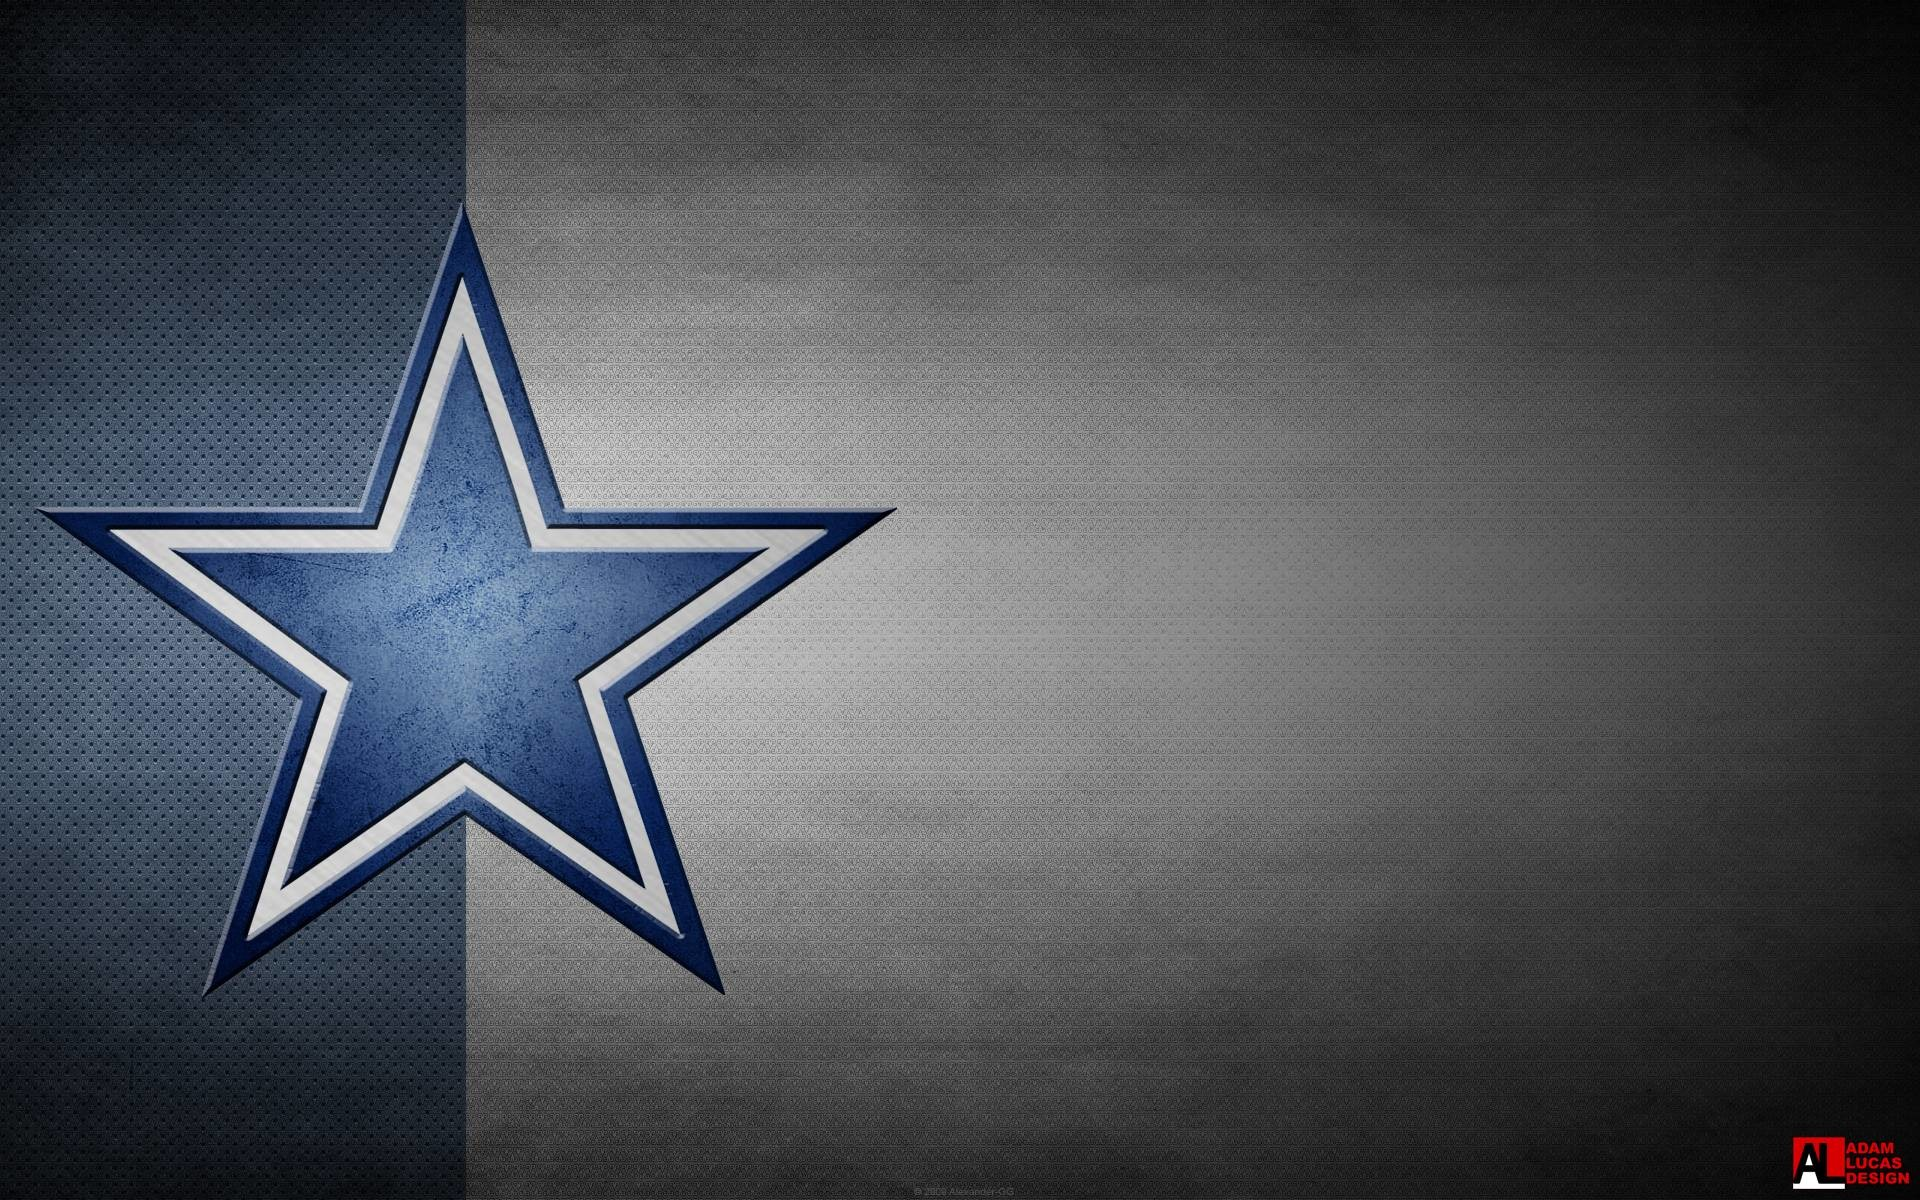 Dallas Cowboys Images Wallpapers 183 ① Wallpapertag